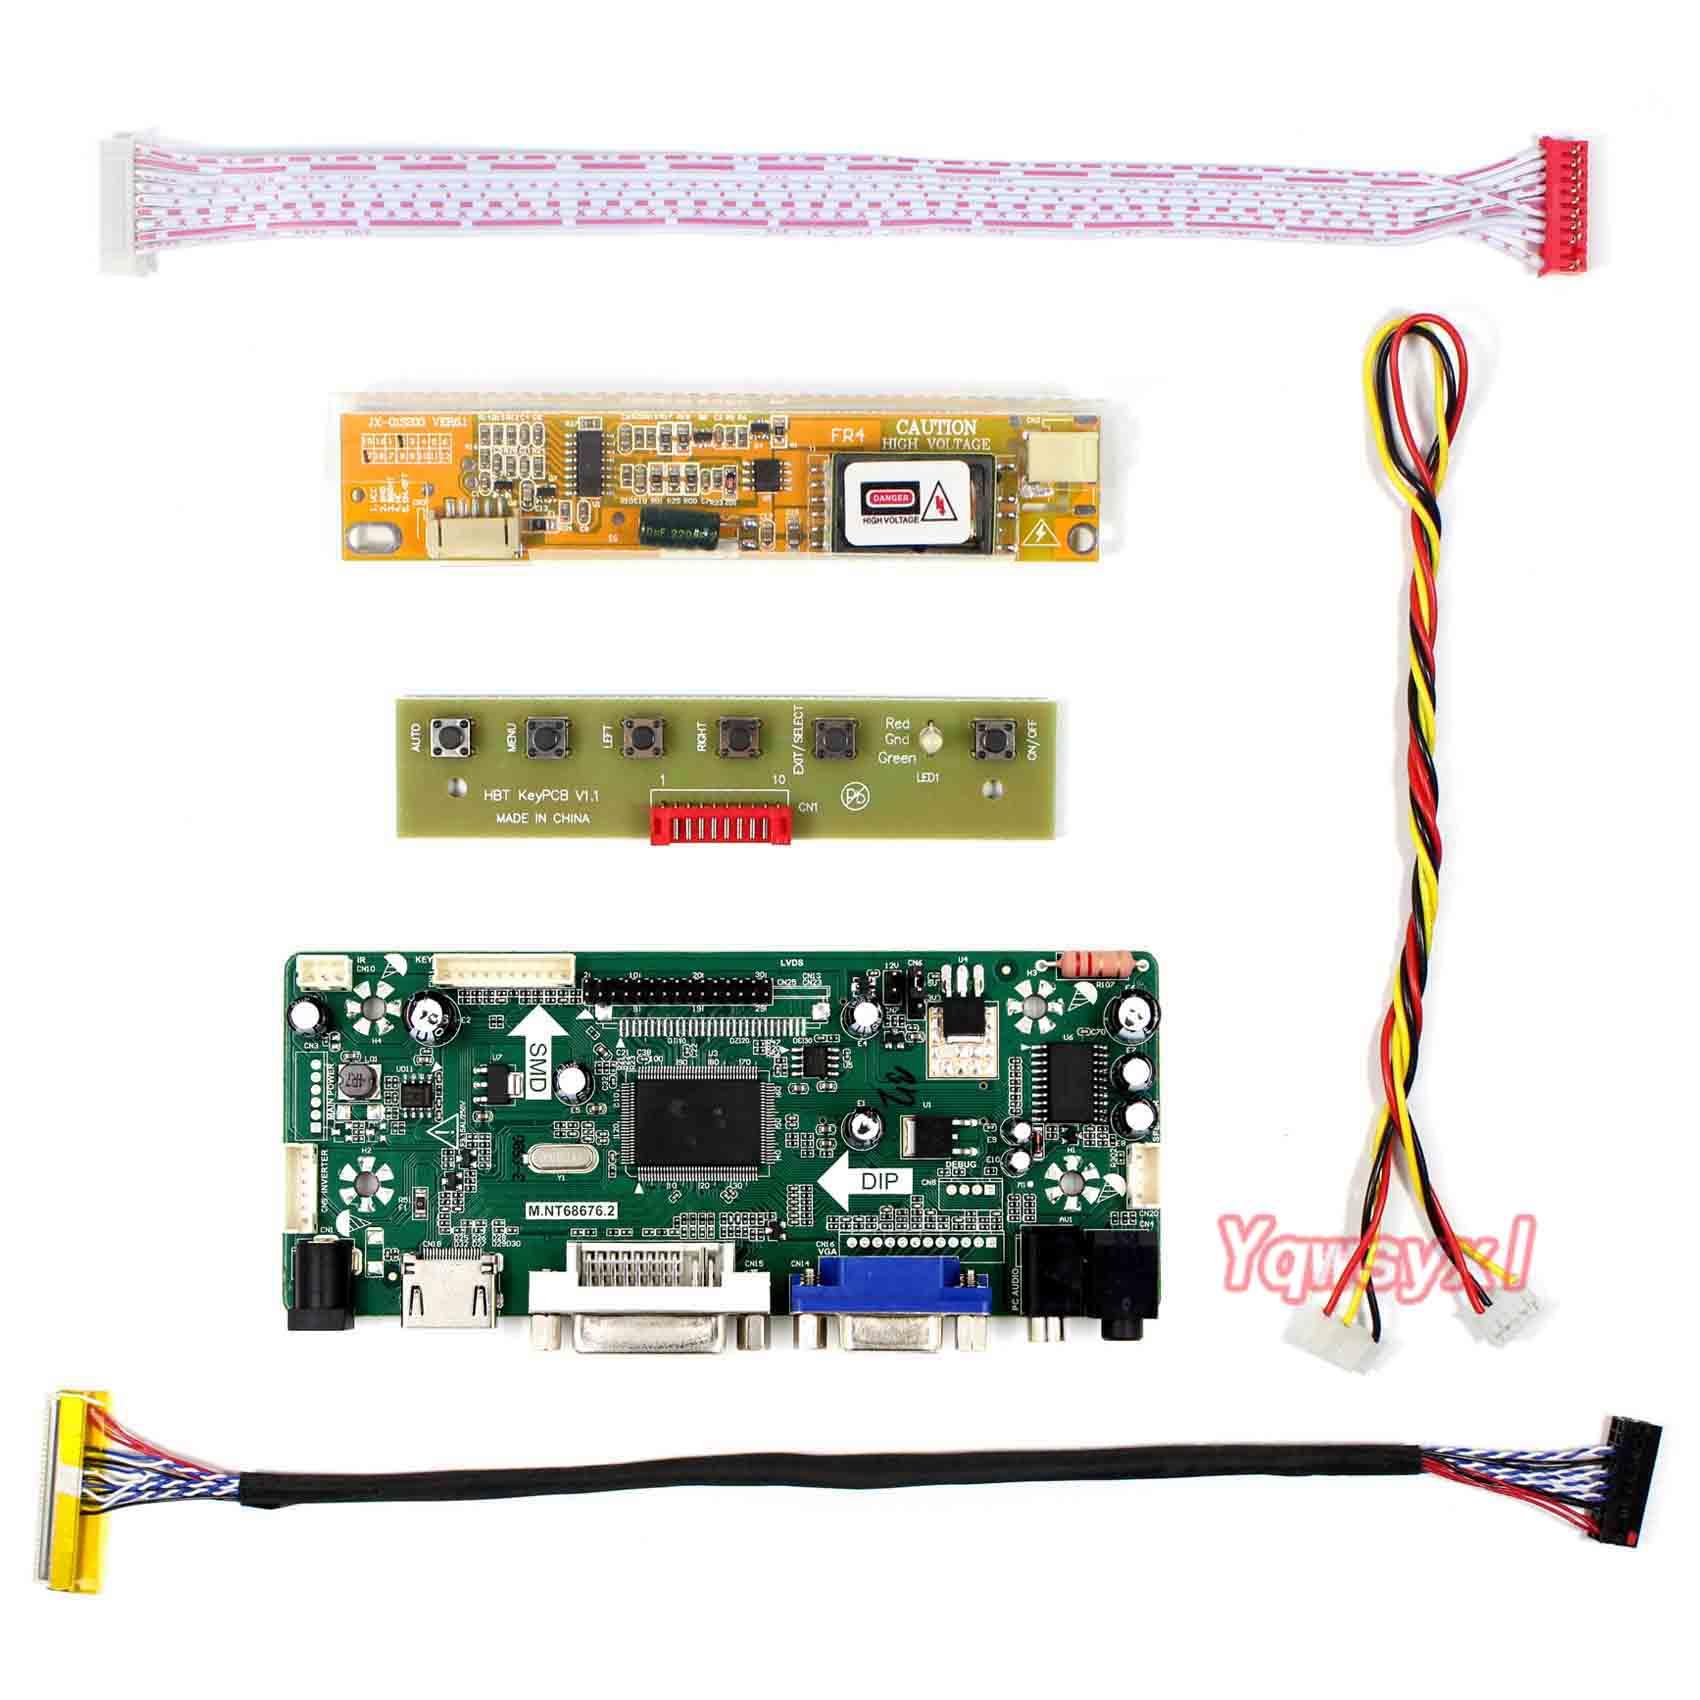 Yqwsyxl Control Board Monitor Kit For B156XW01 V.0 V0 HDMI + DVI + VGA LCD LED Screen Controller Board Driver